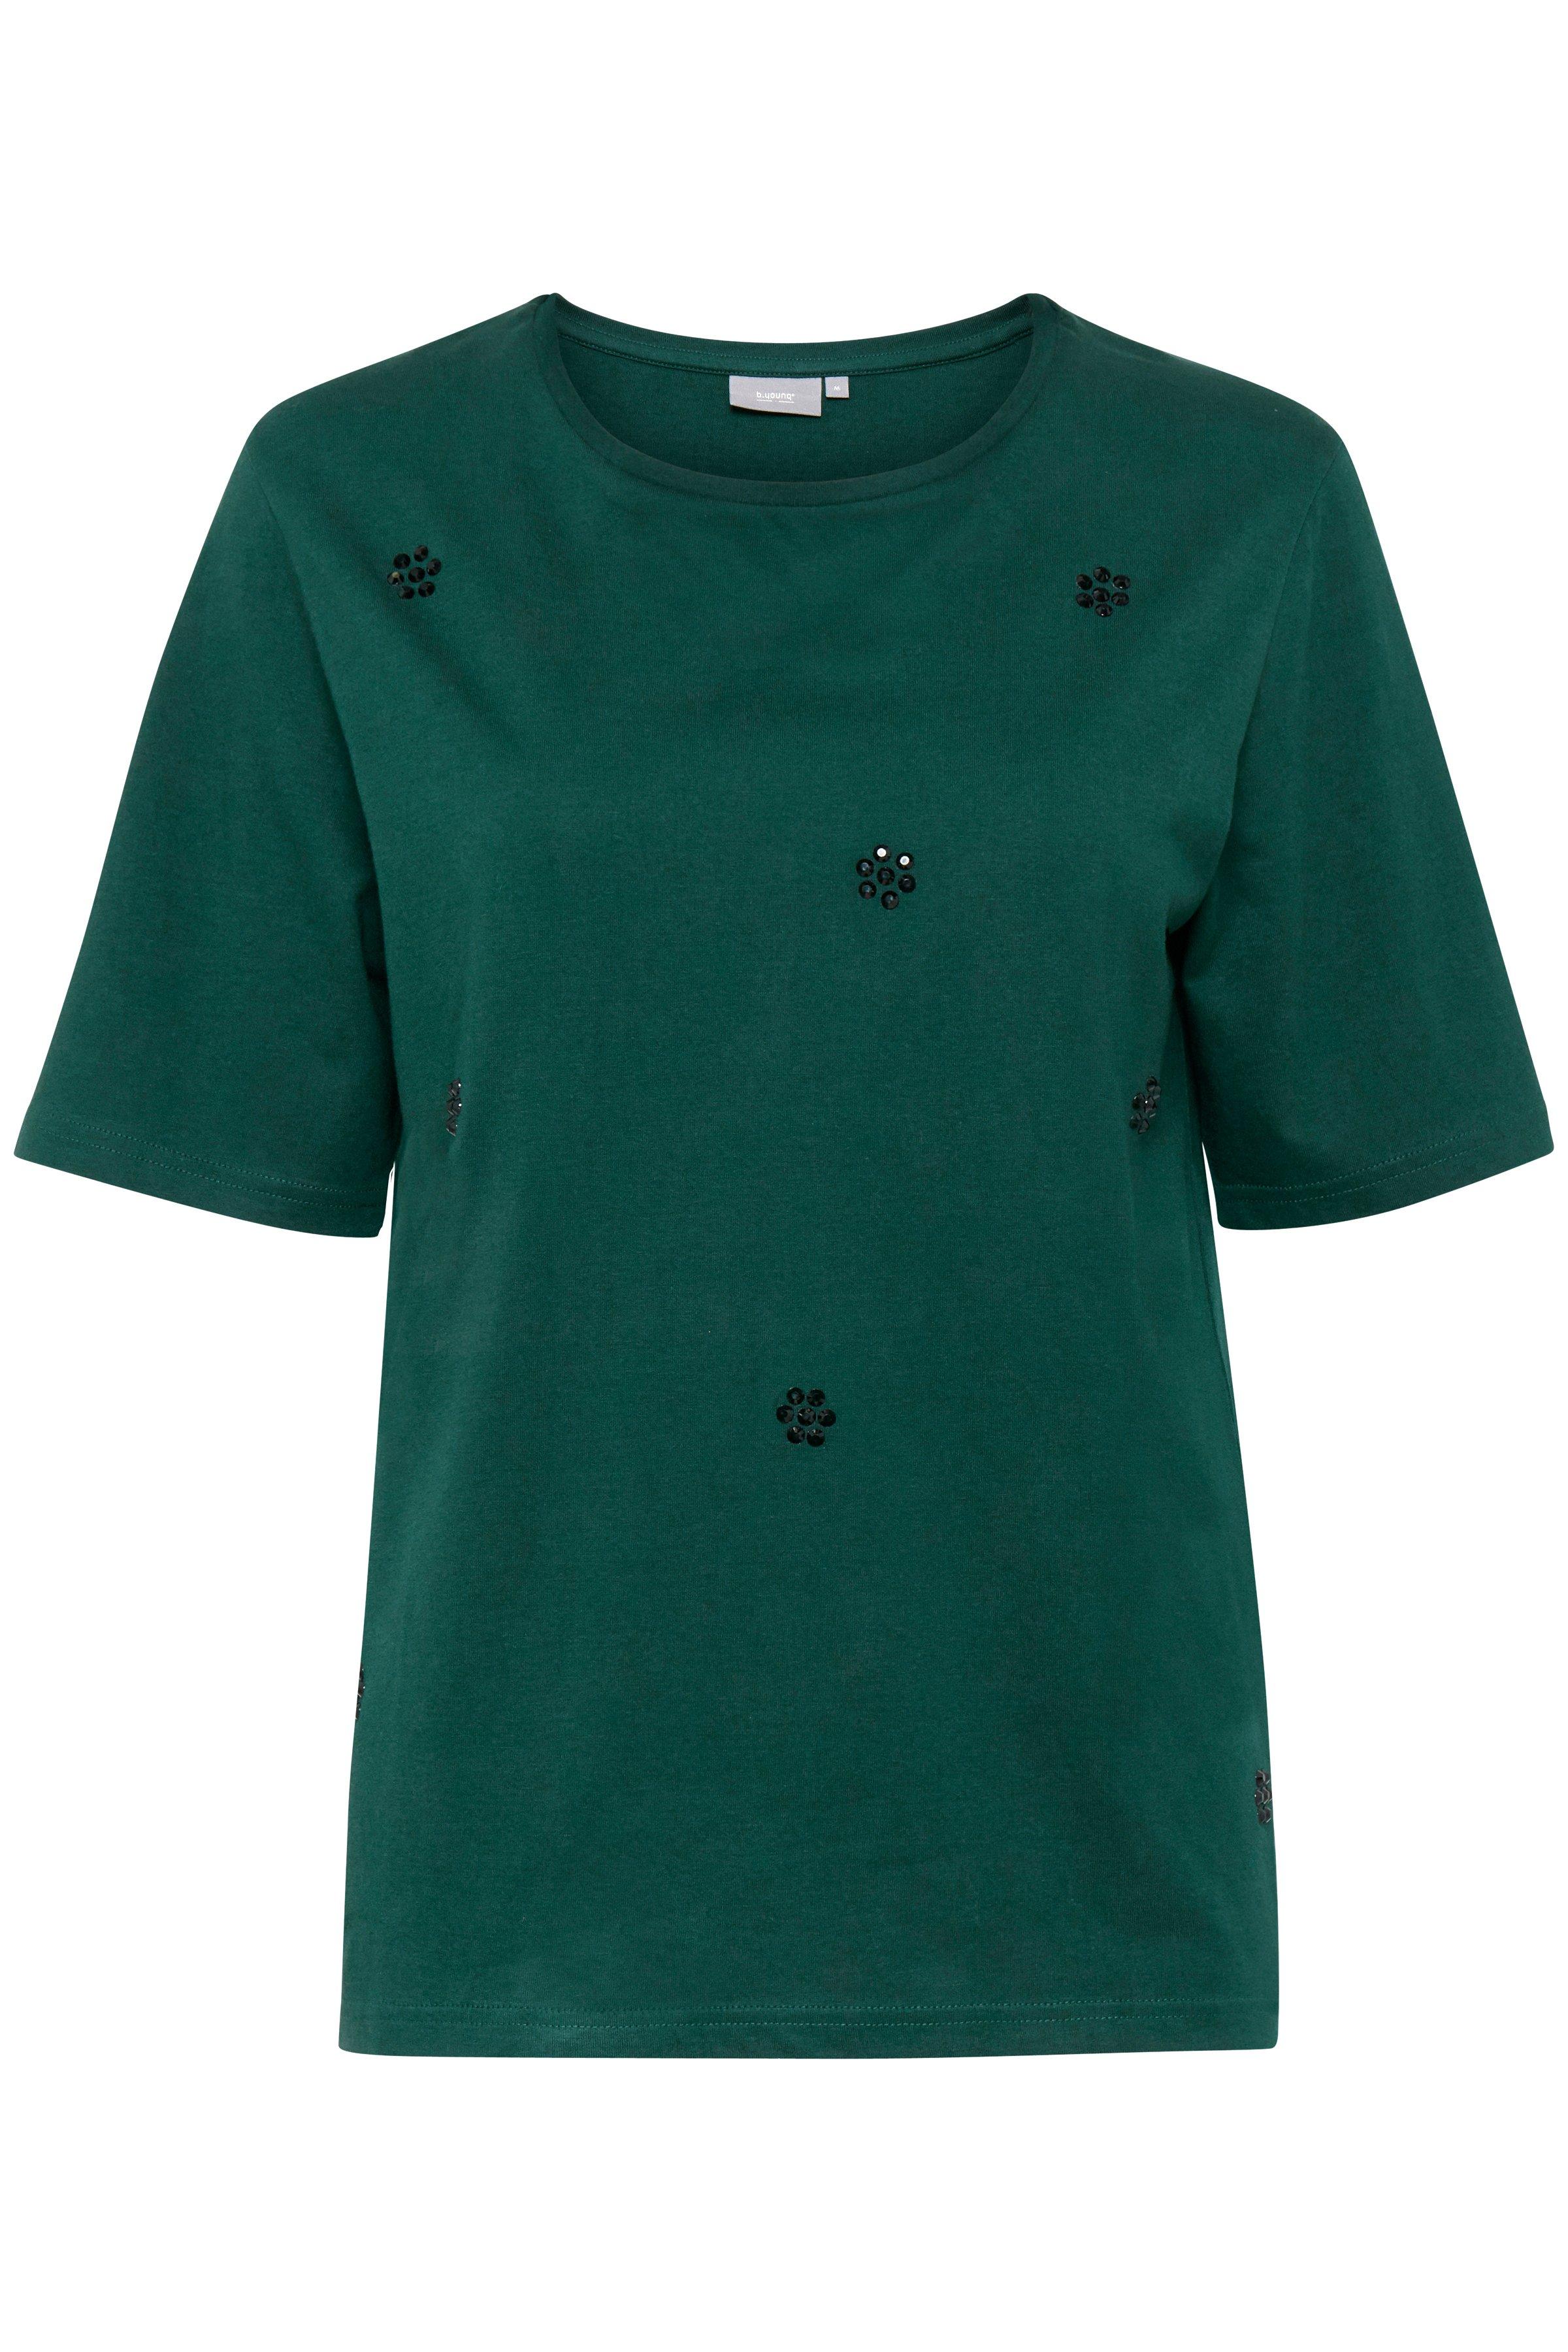 b.young Dame T-shirt  - Flaskegrøn